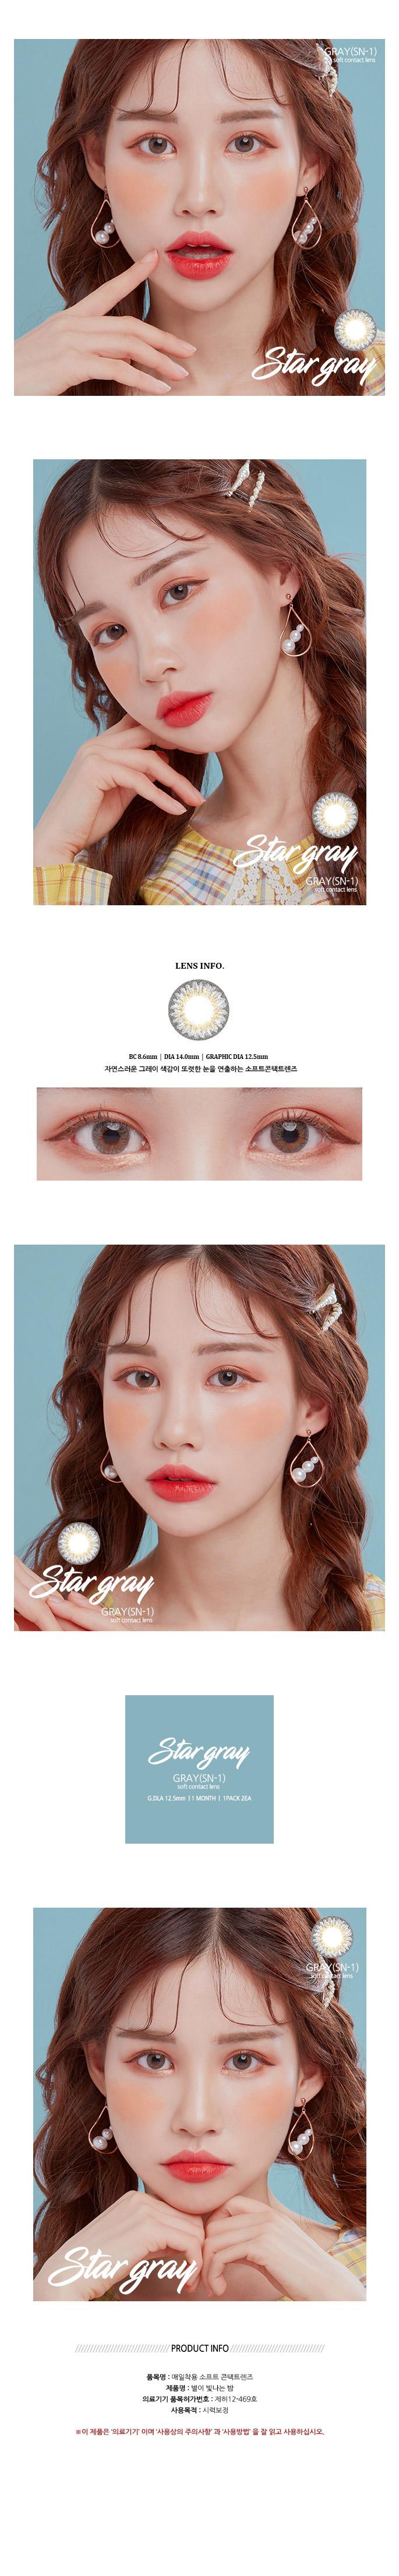 star-3color-gray-sn1-korean-circle-lenses.jpg